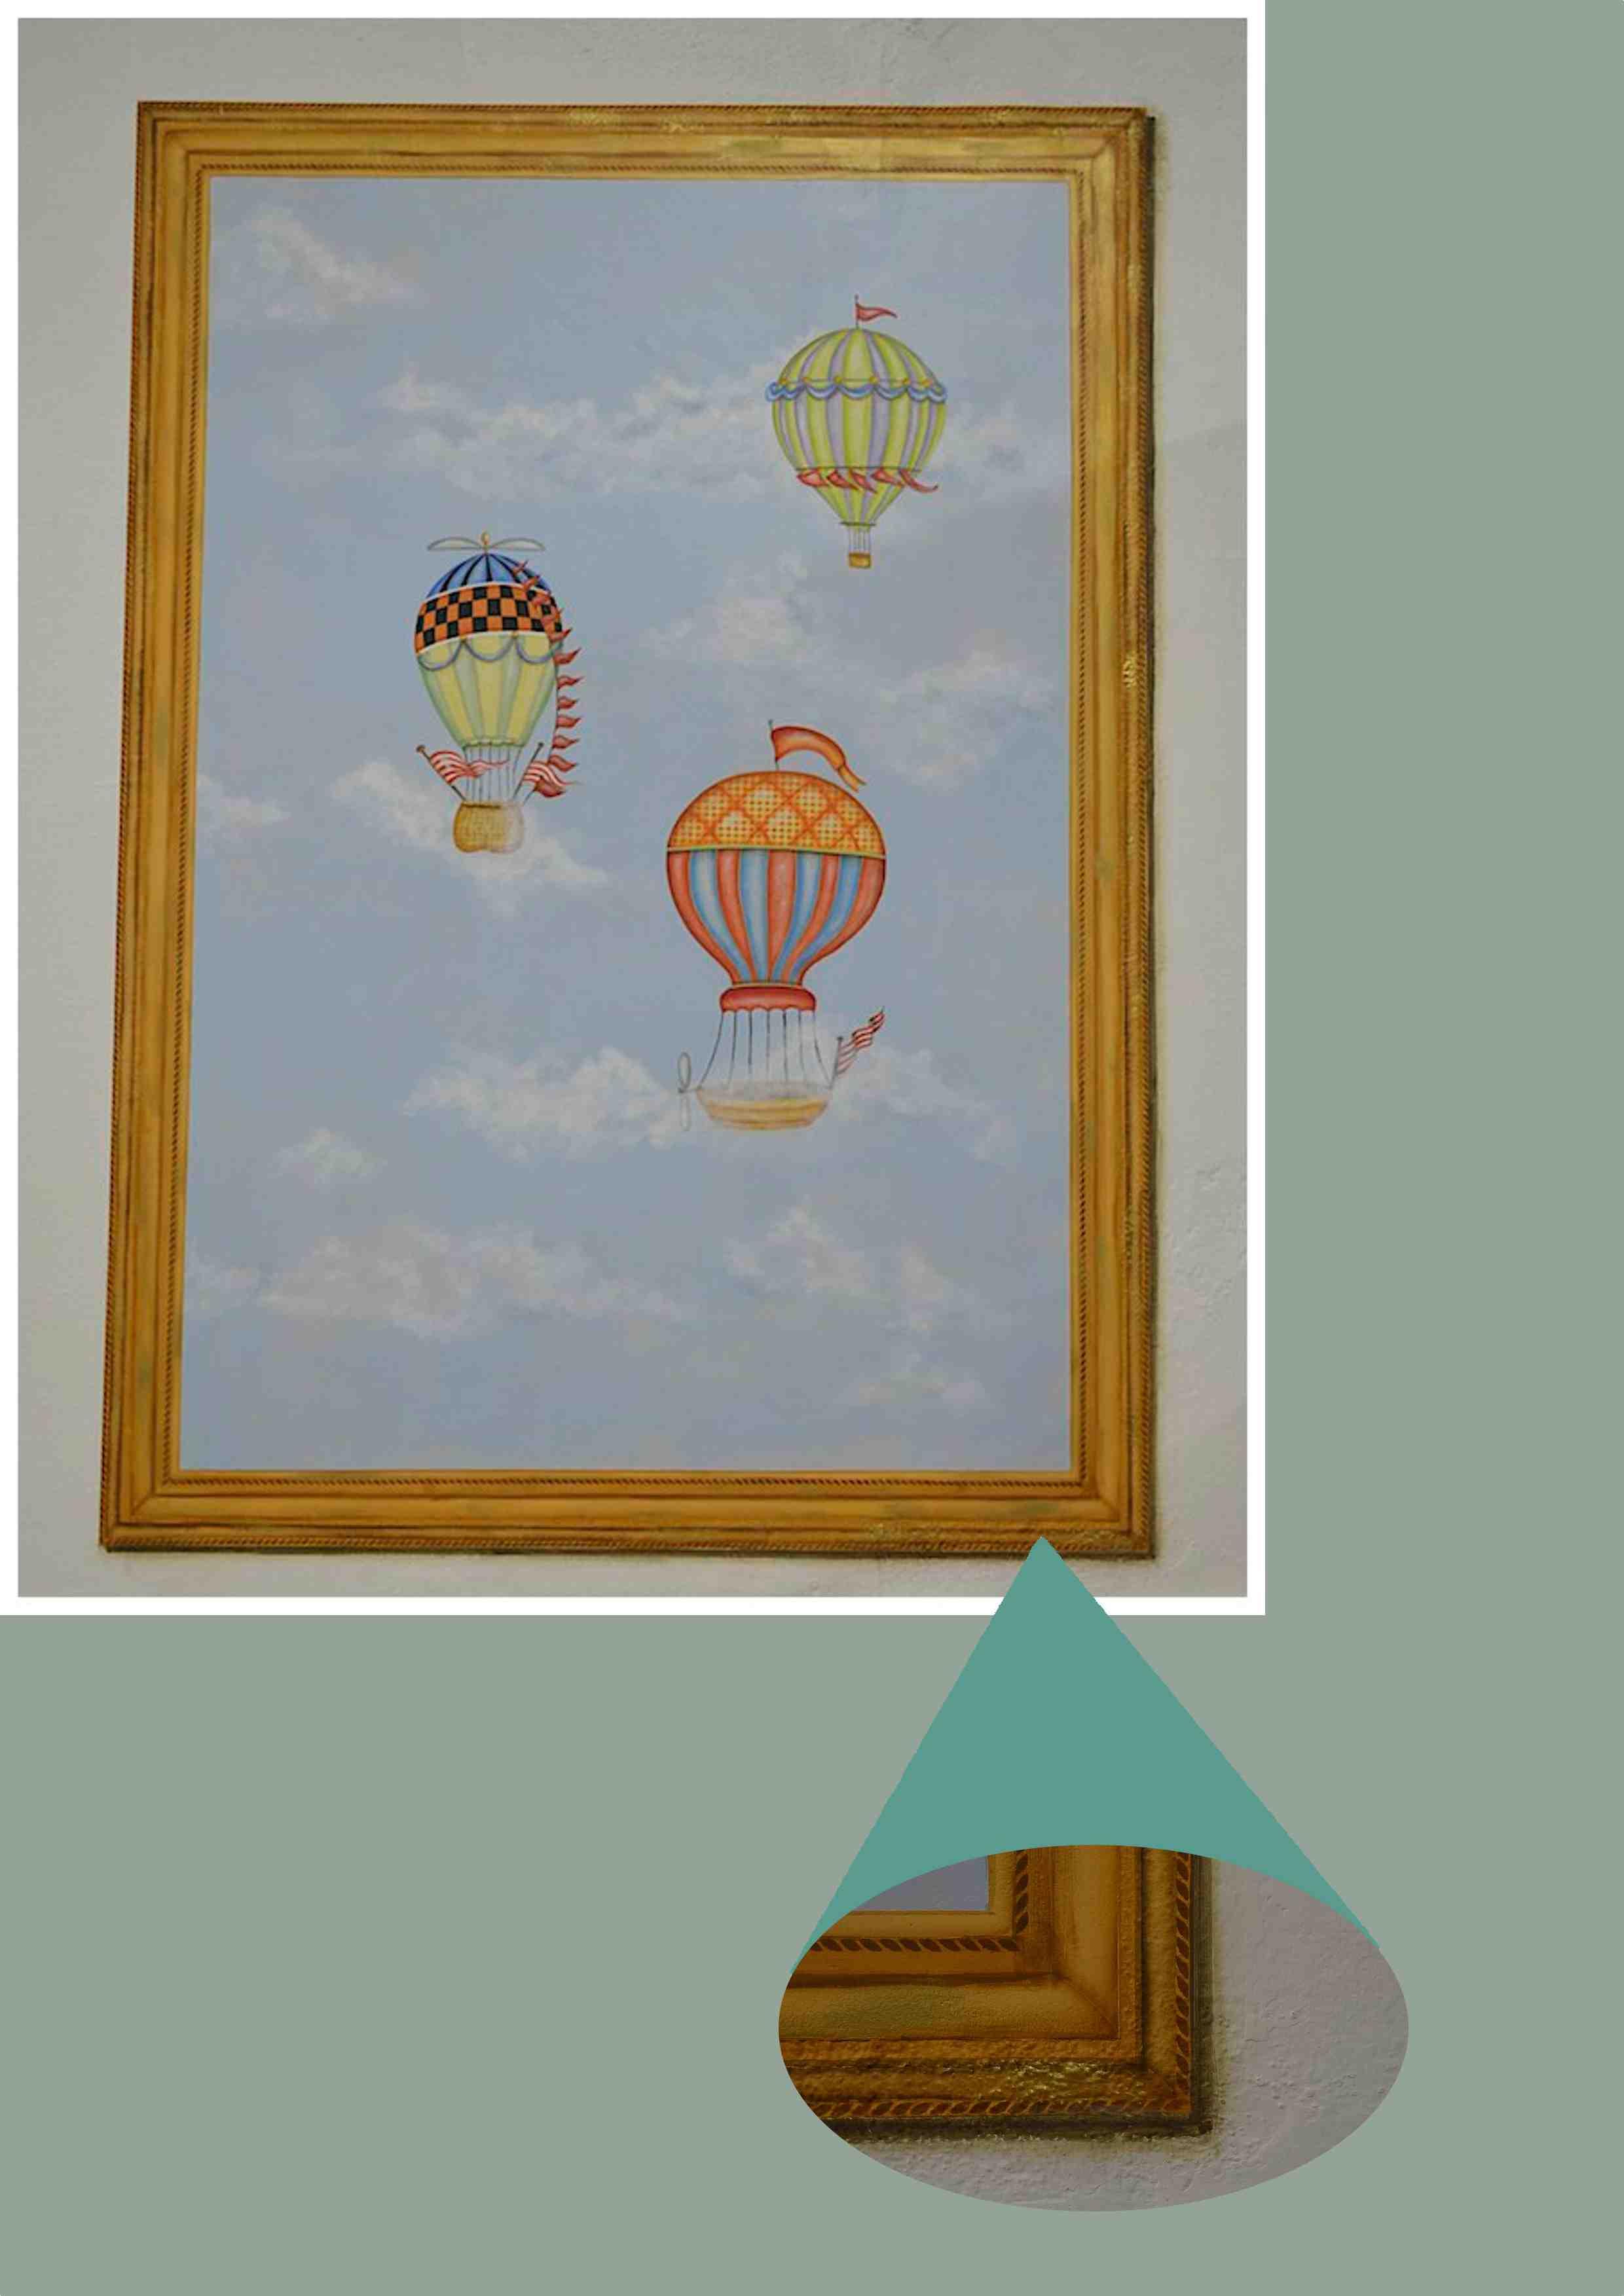 Baloes Imperio 2.jpg